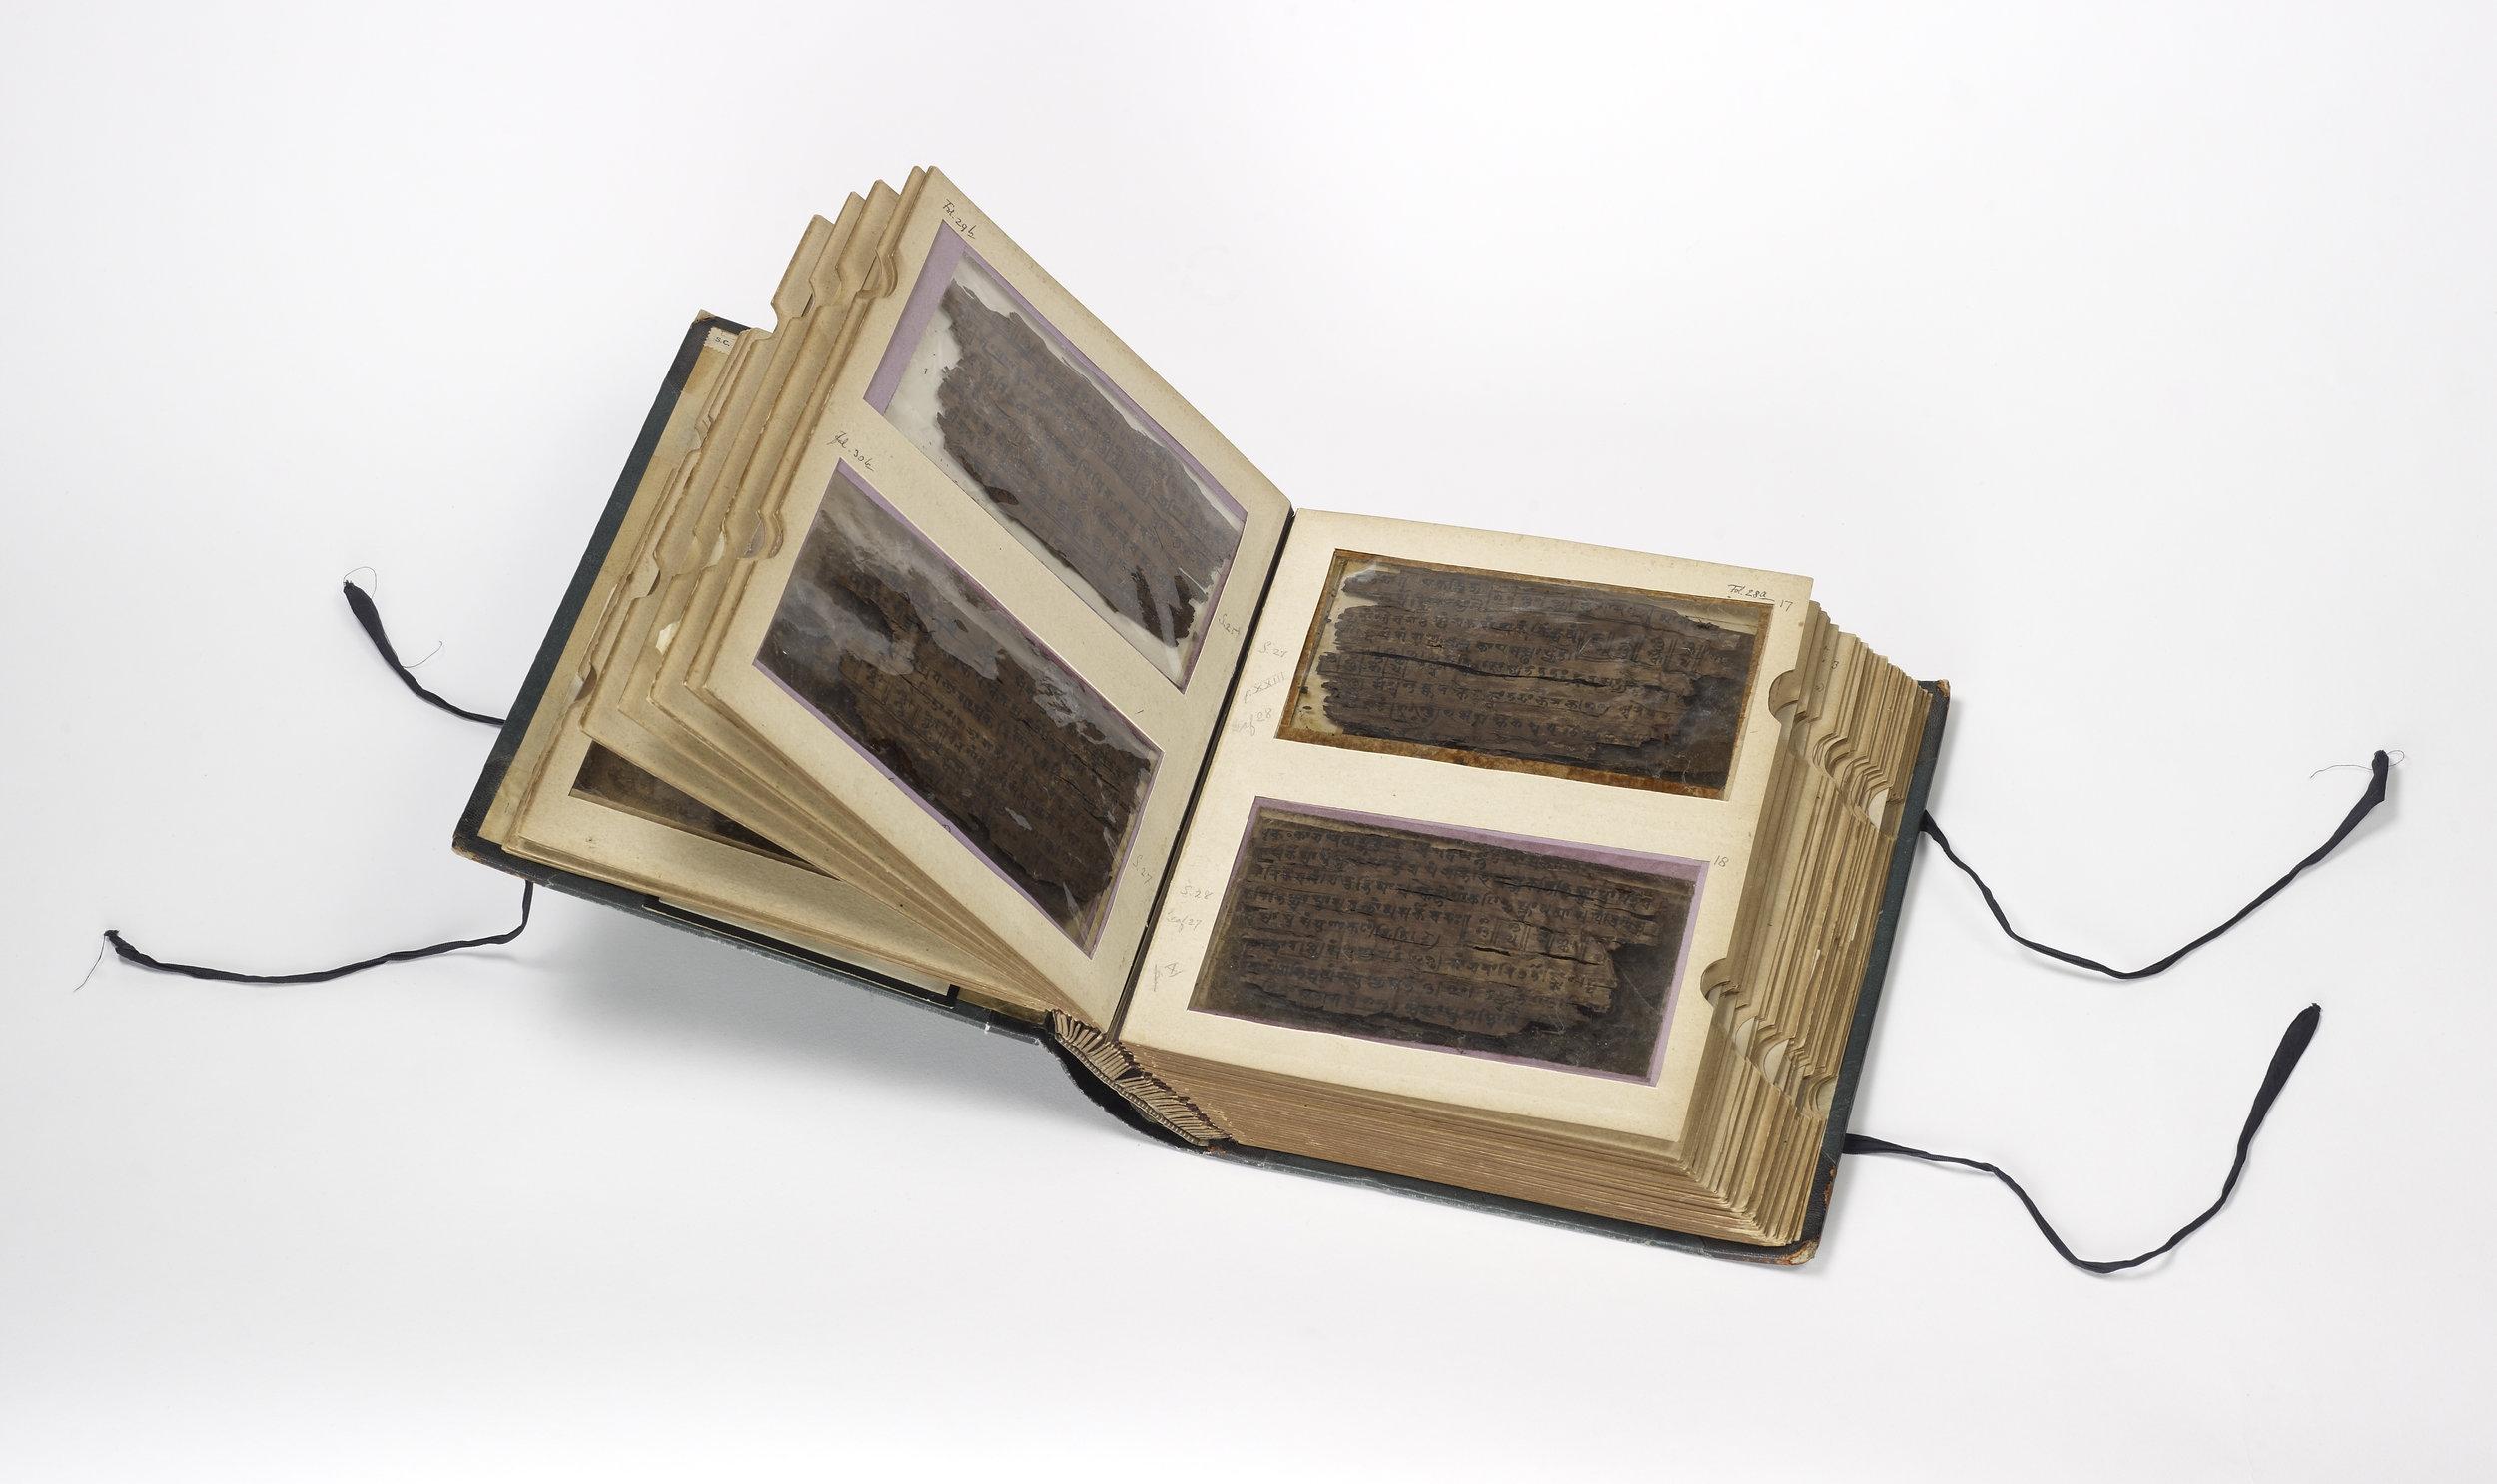 70 page Bakhshali manuscript 224-383 CE Bodleian Libraries University of Oxford.jpg